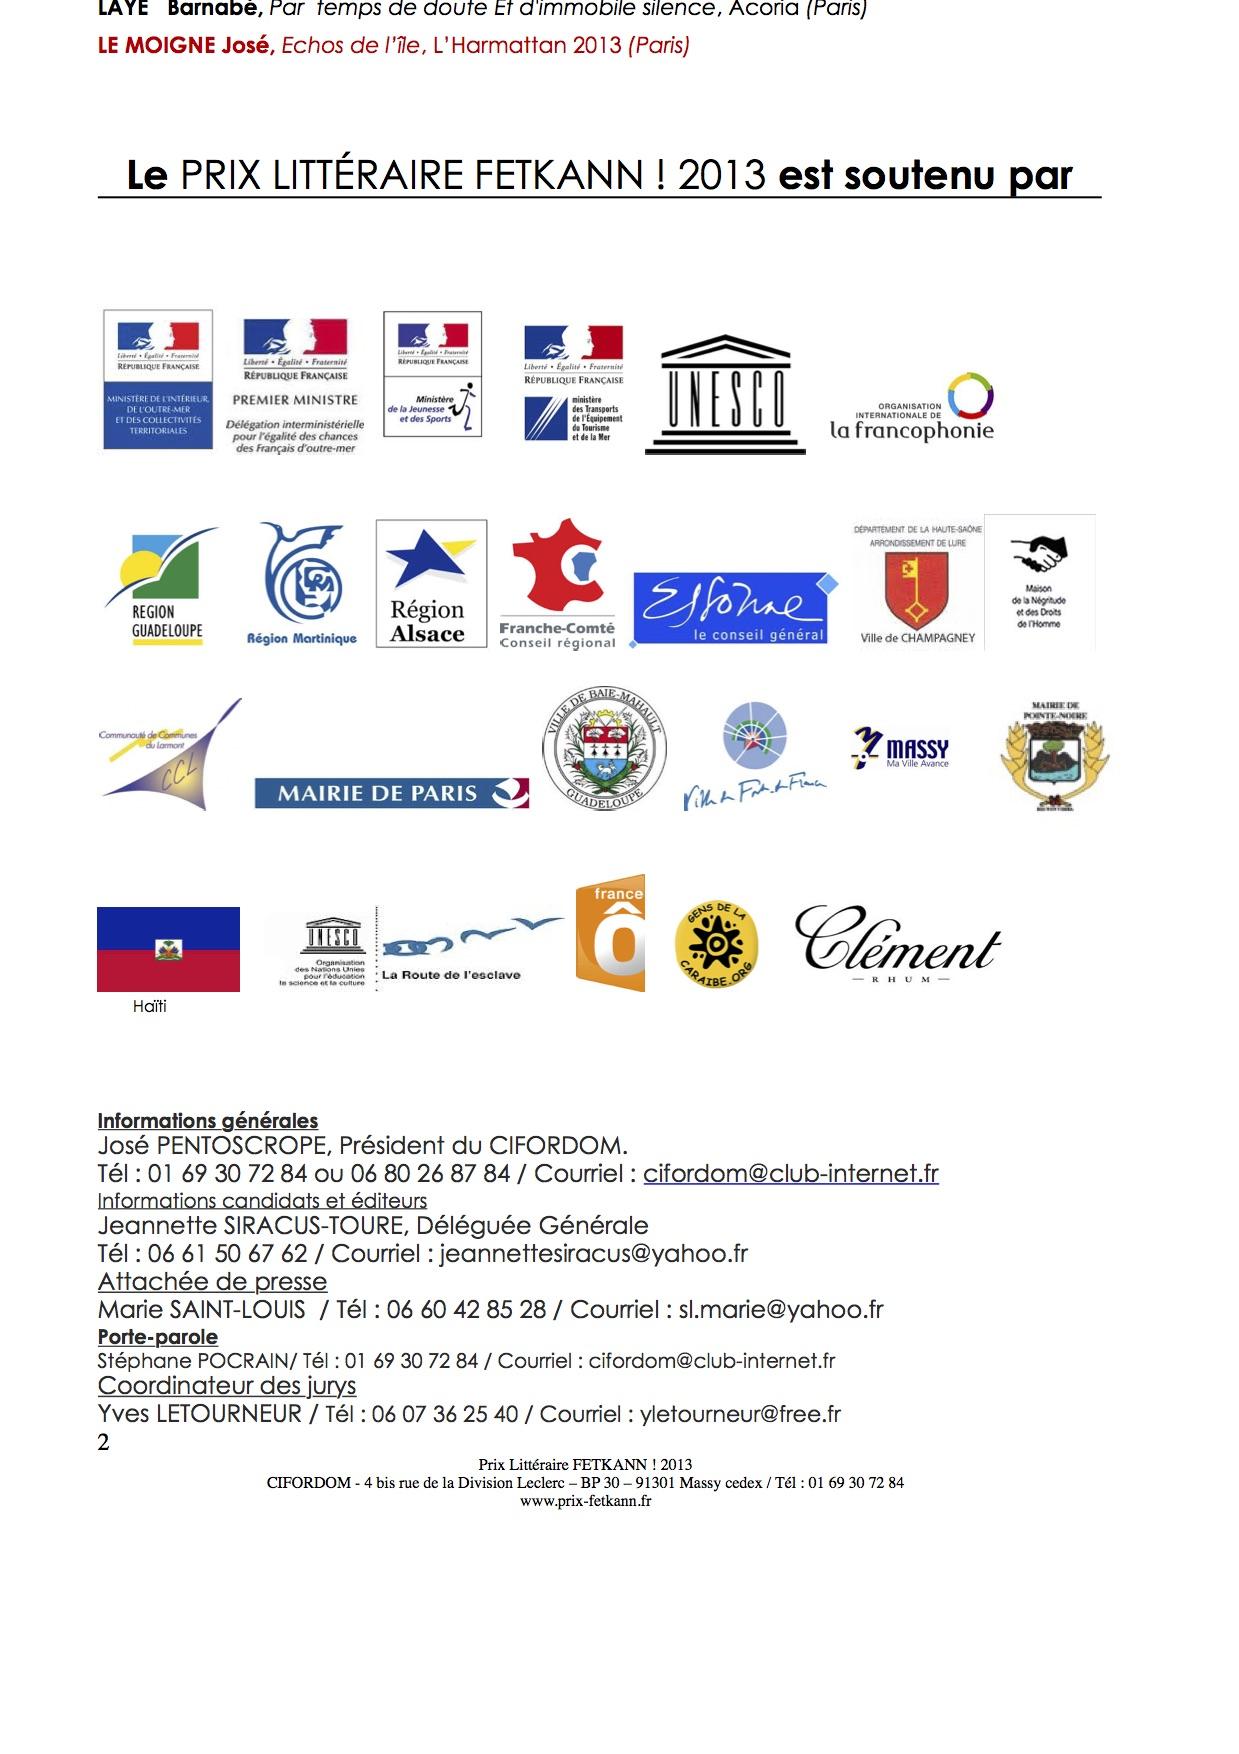 CP Prix_FETKANN_les pressentis_2013-2